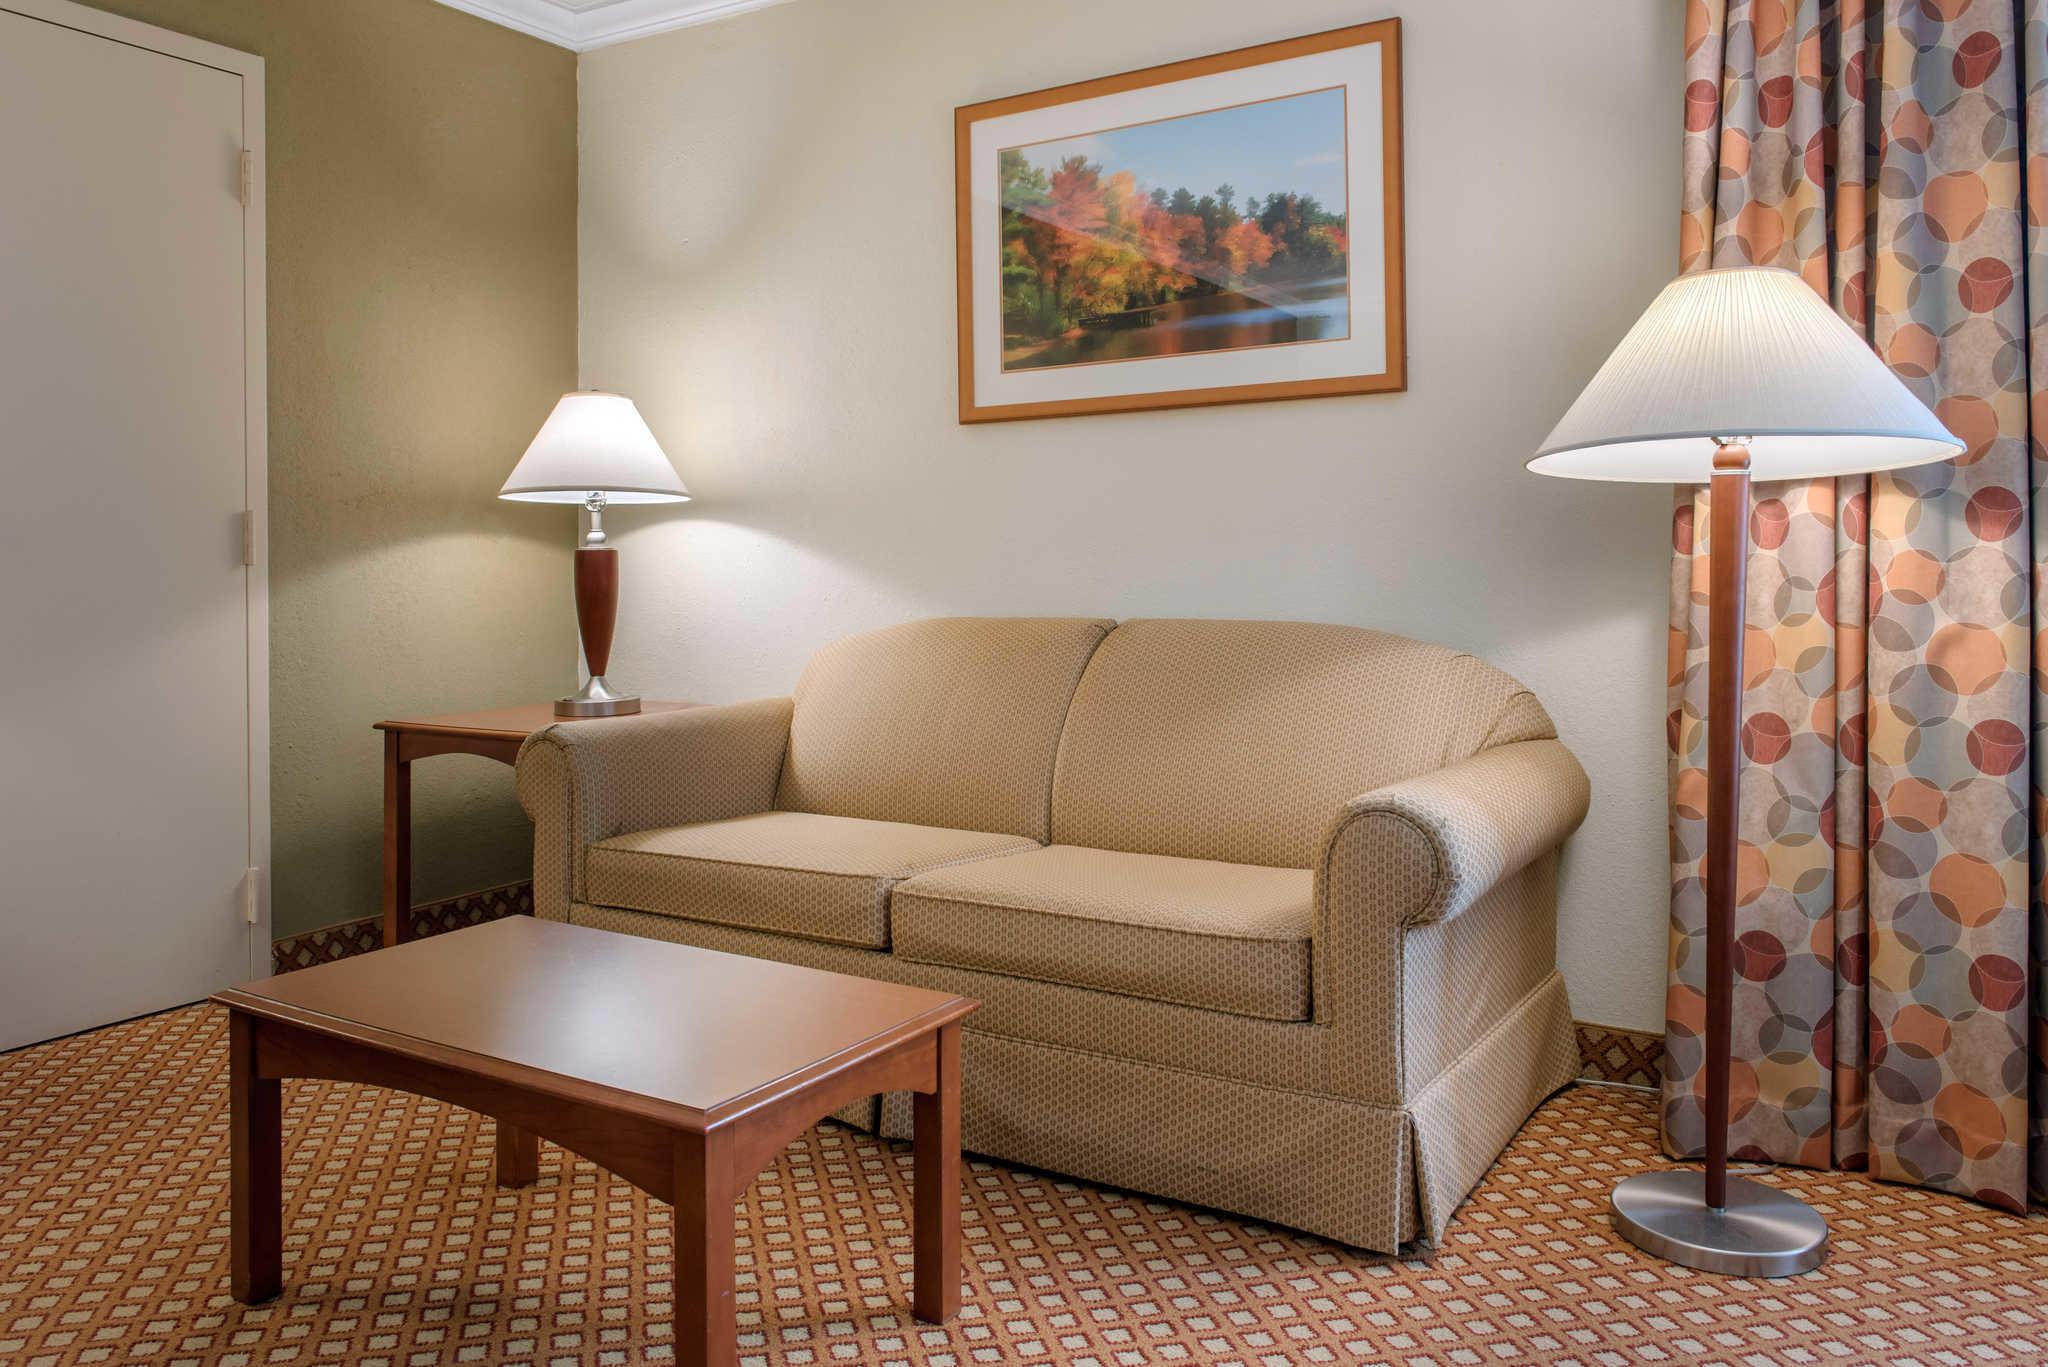 Quality Hotel - Cincinnati Blue Ash image 19